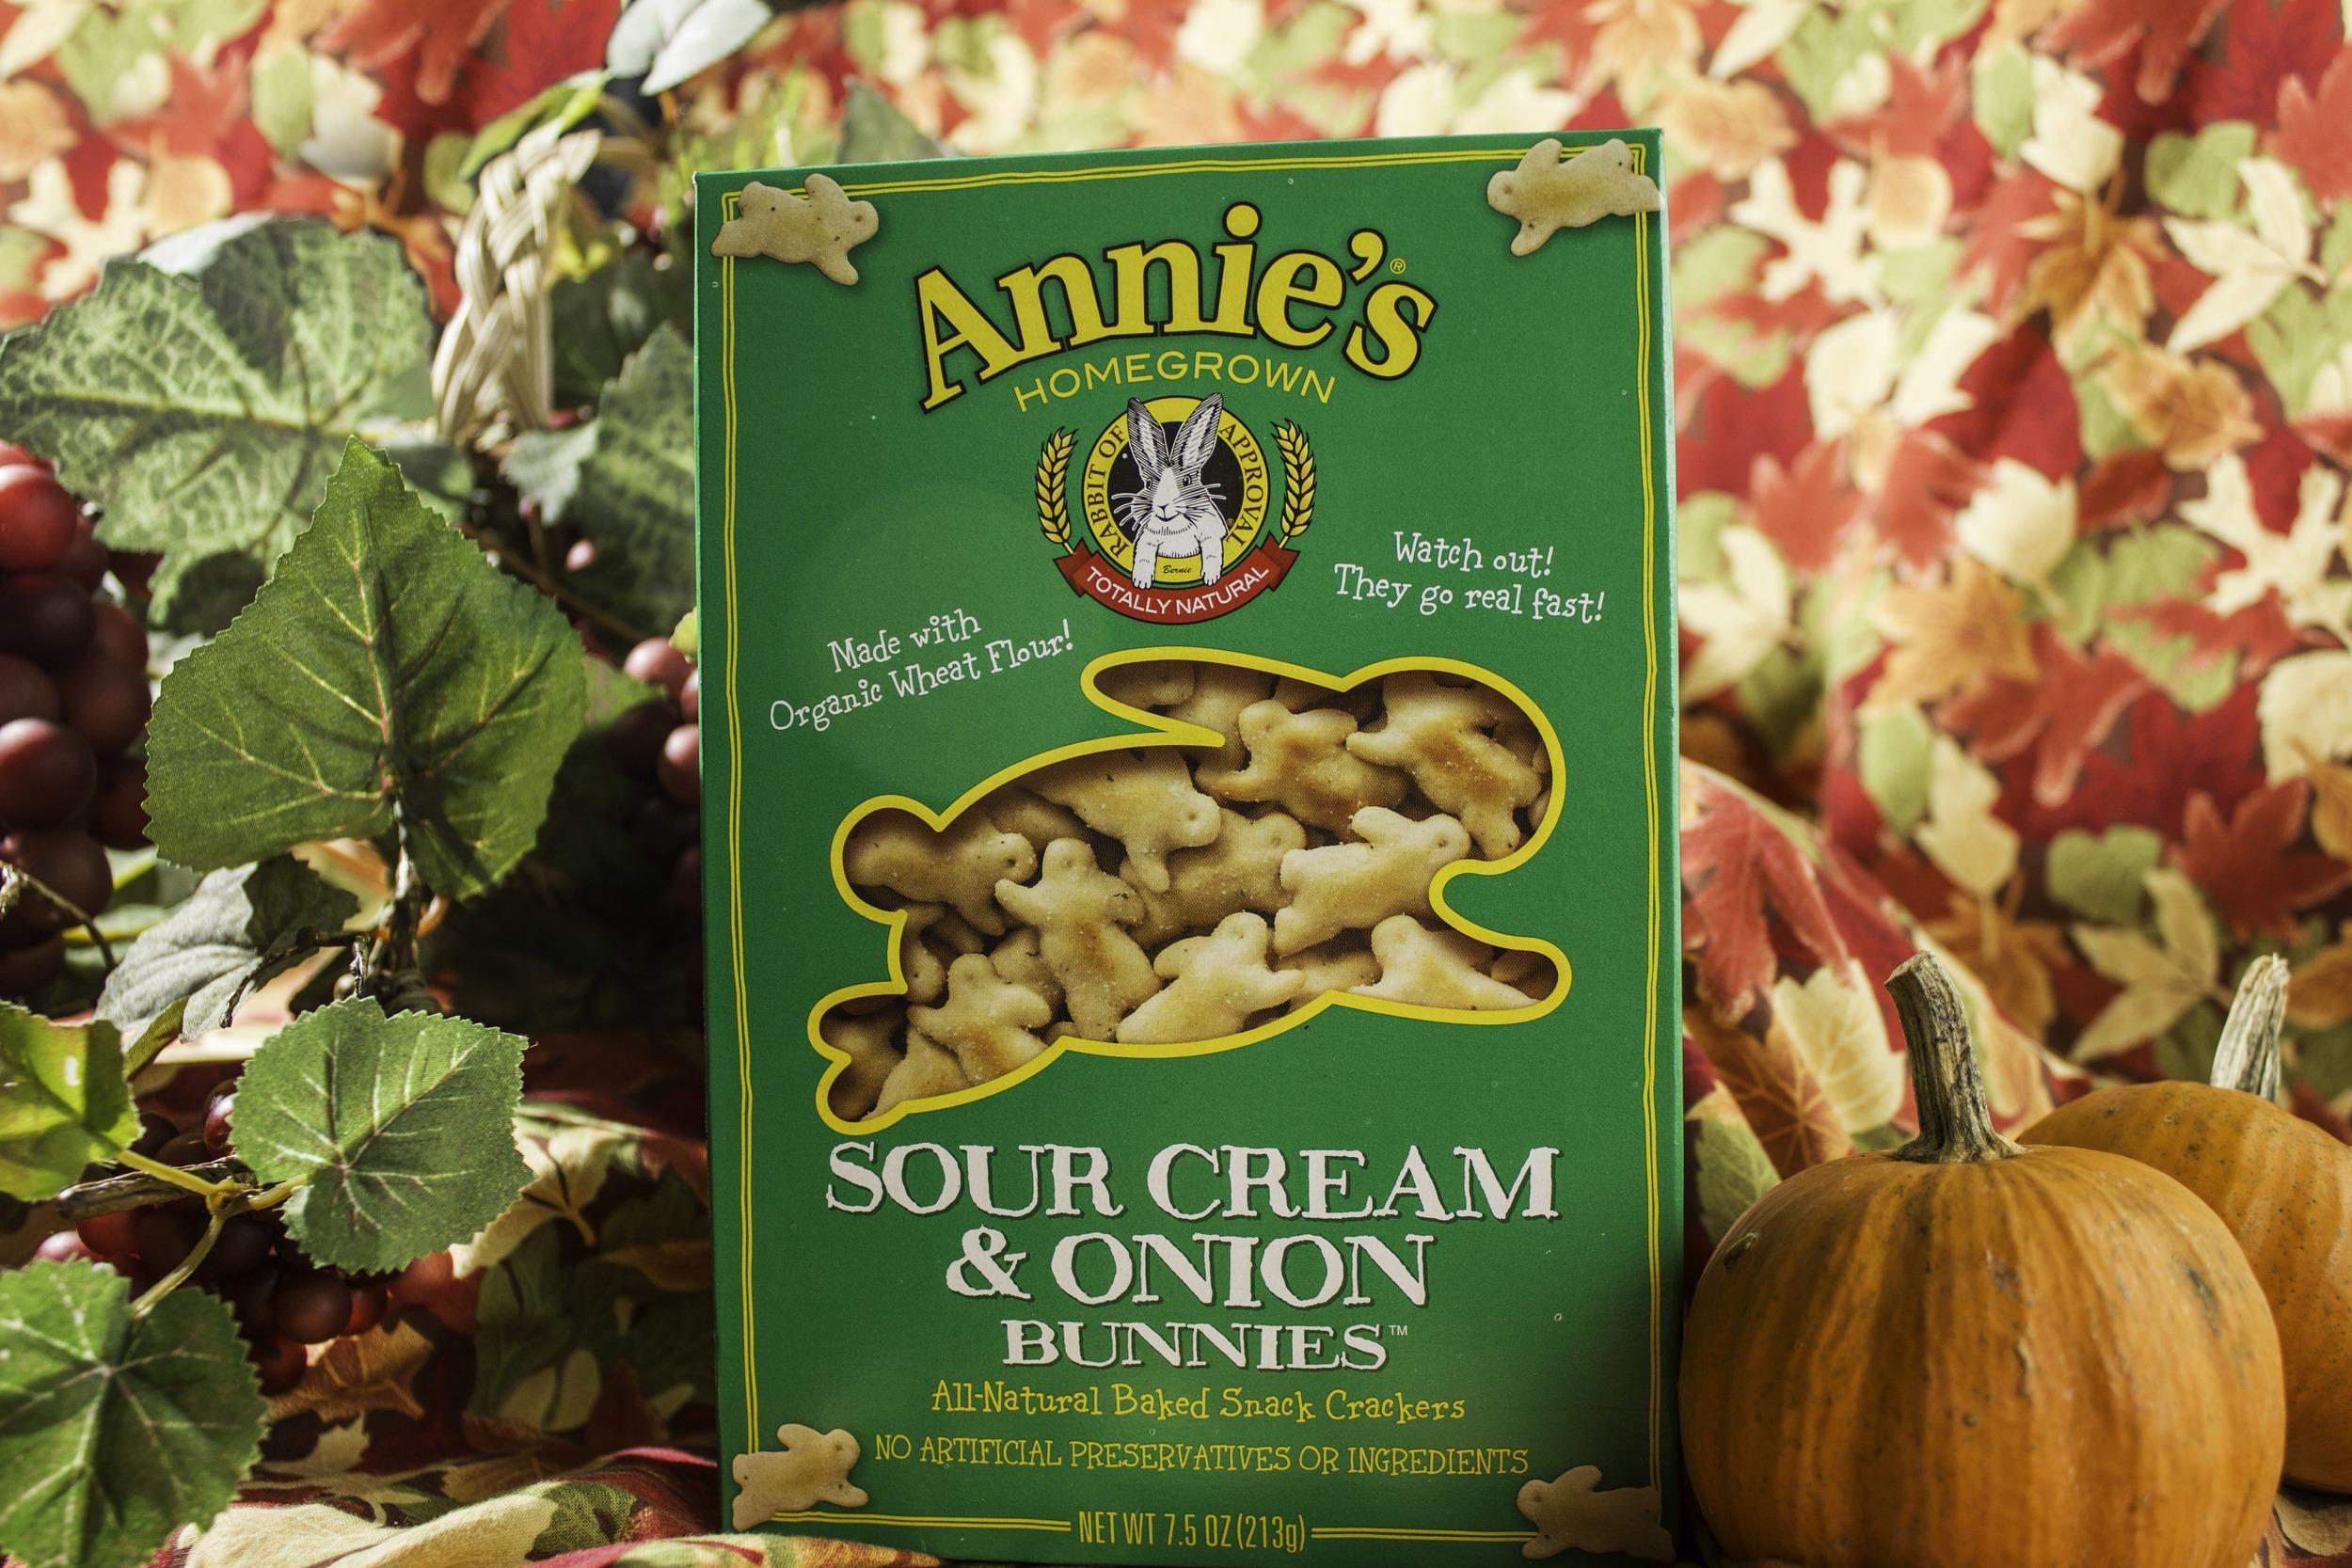 annies sour cream and onion .jpg